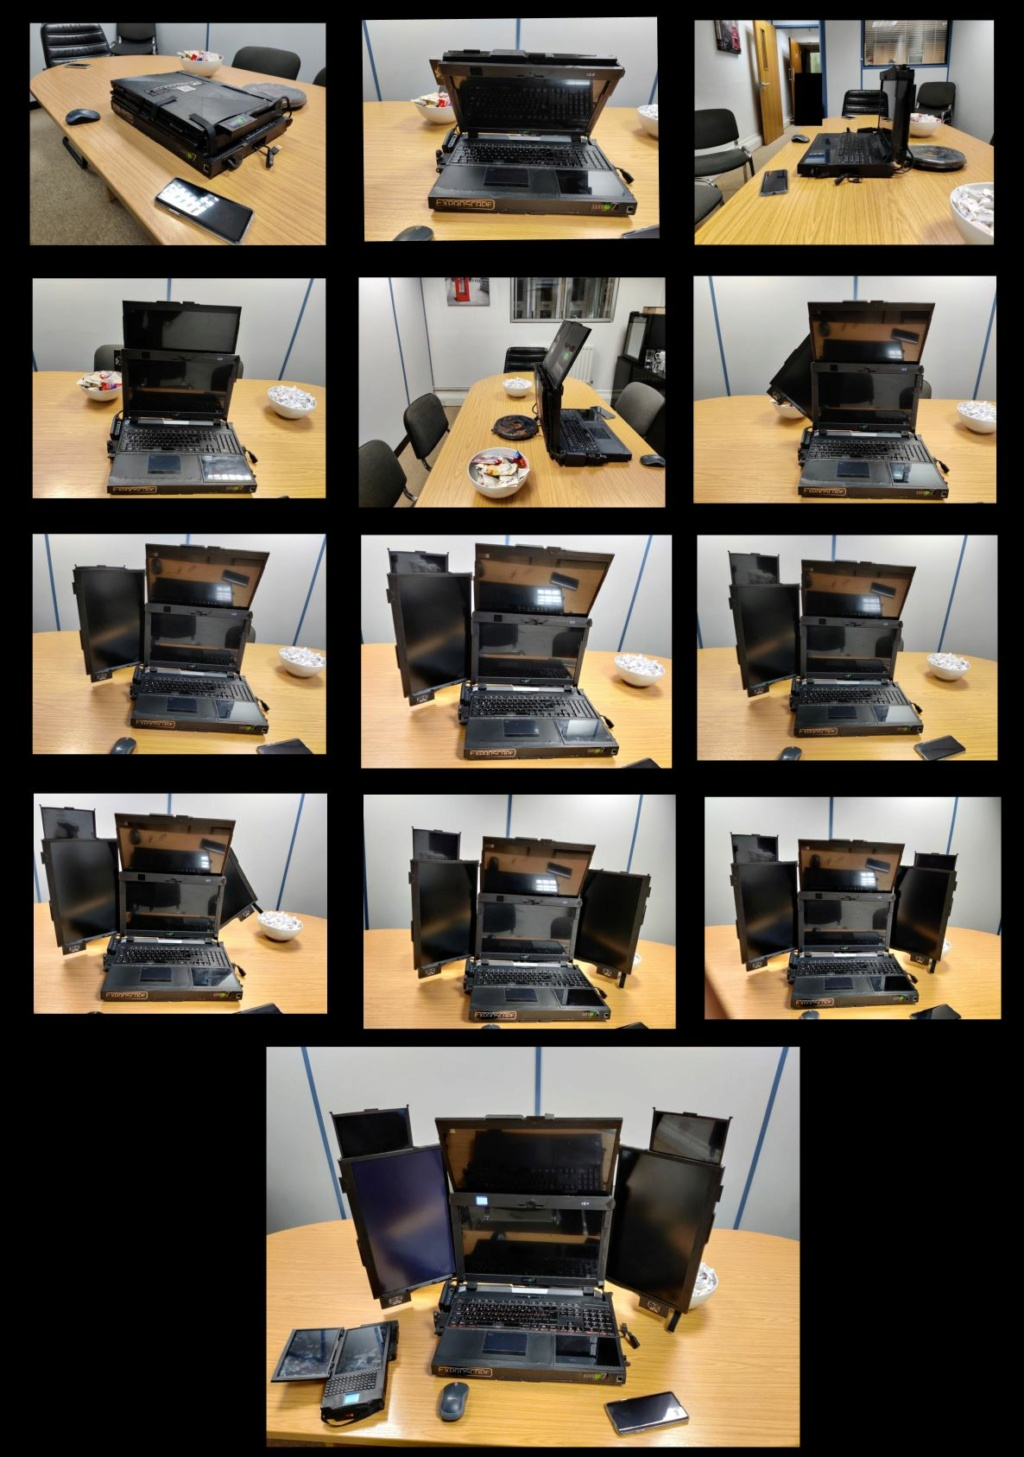 Ноутбук Aurora с 7 дисплеями. Expanscape. Великобритания Aurora10